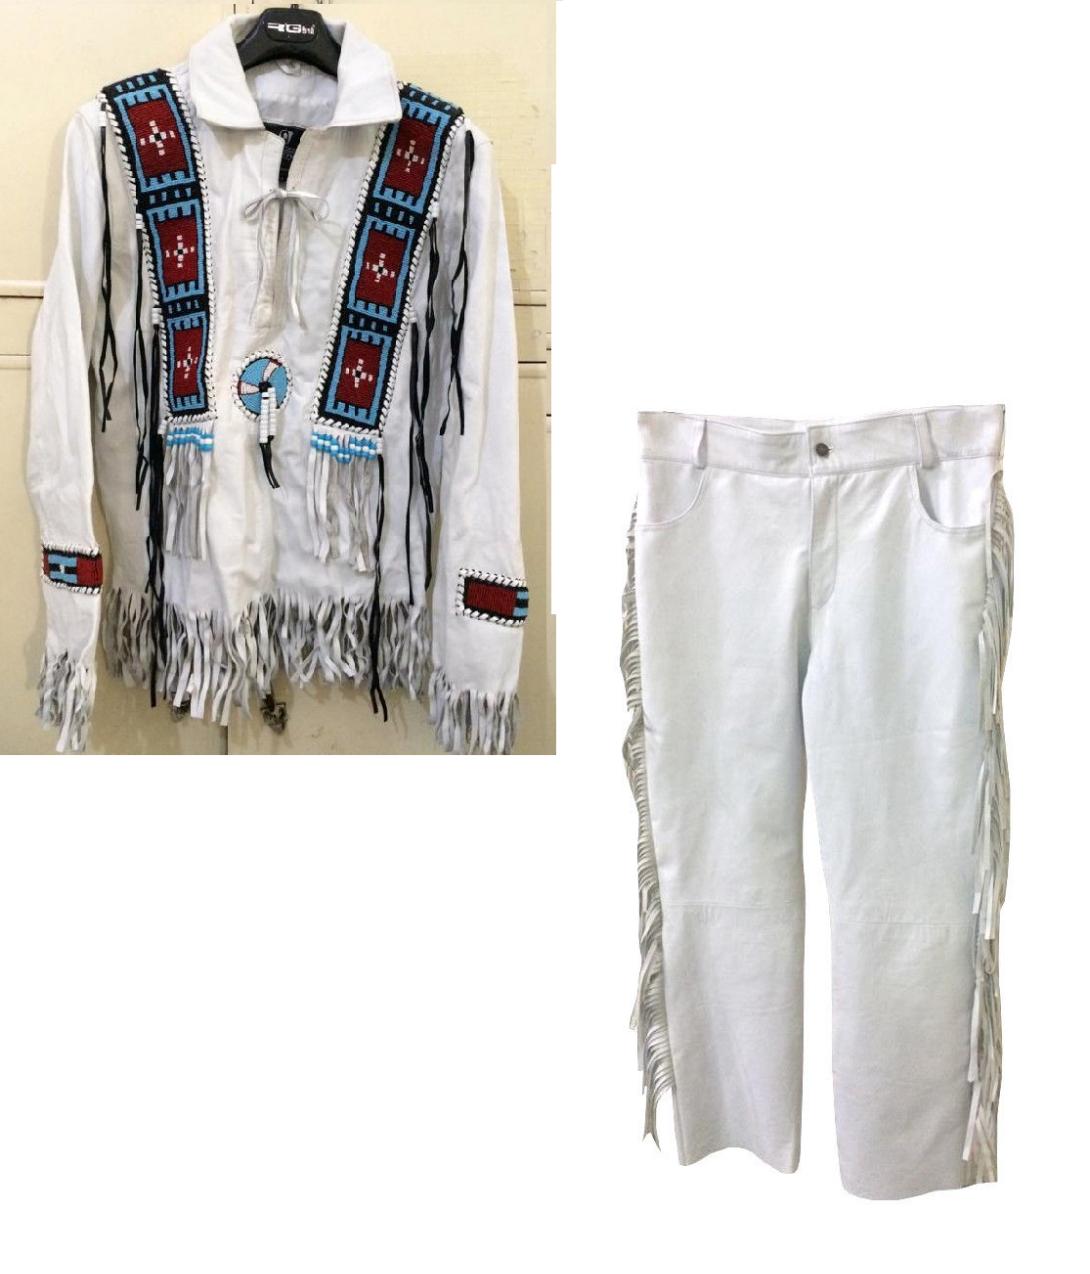 Men's New Native American Buckskin White Leather Beads Hippie Shirt & Pant WS72 image 7